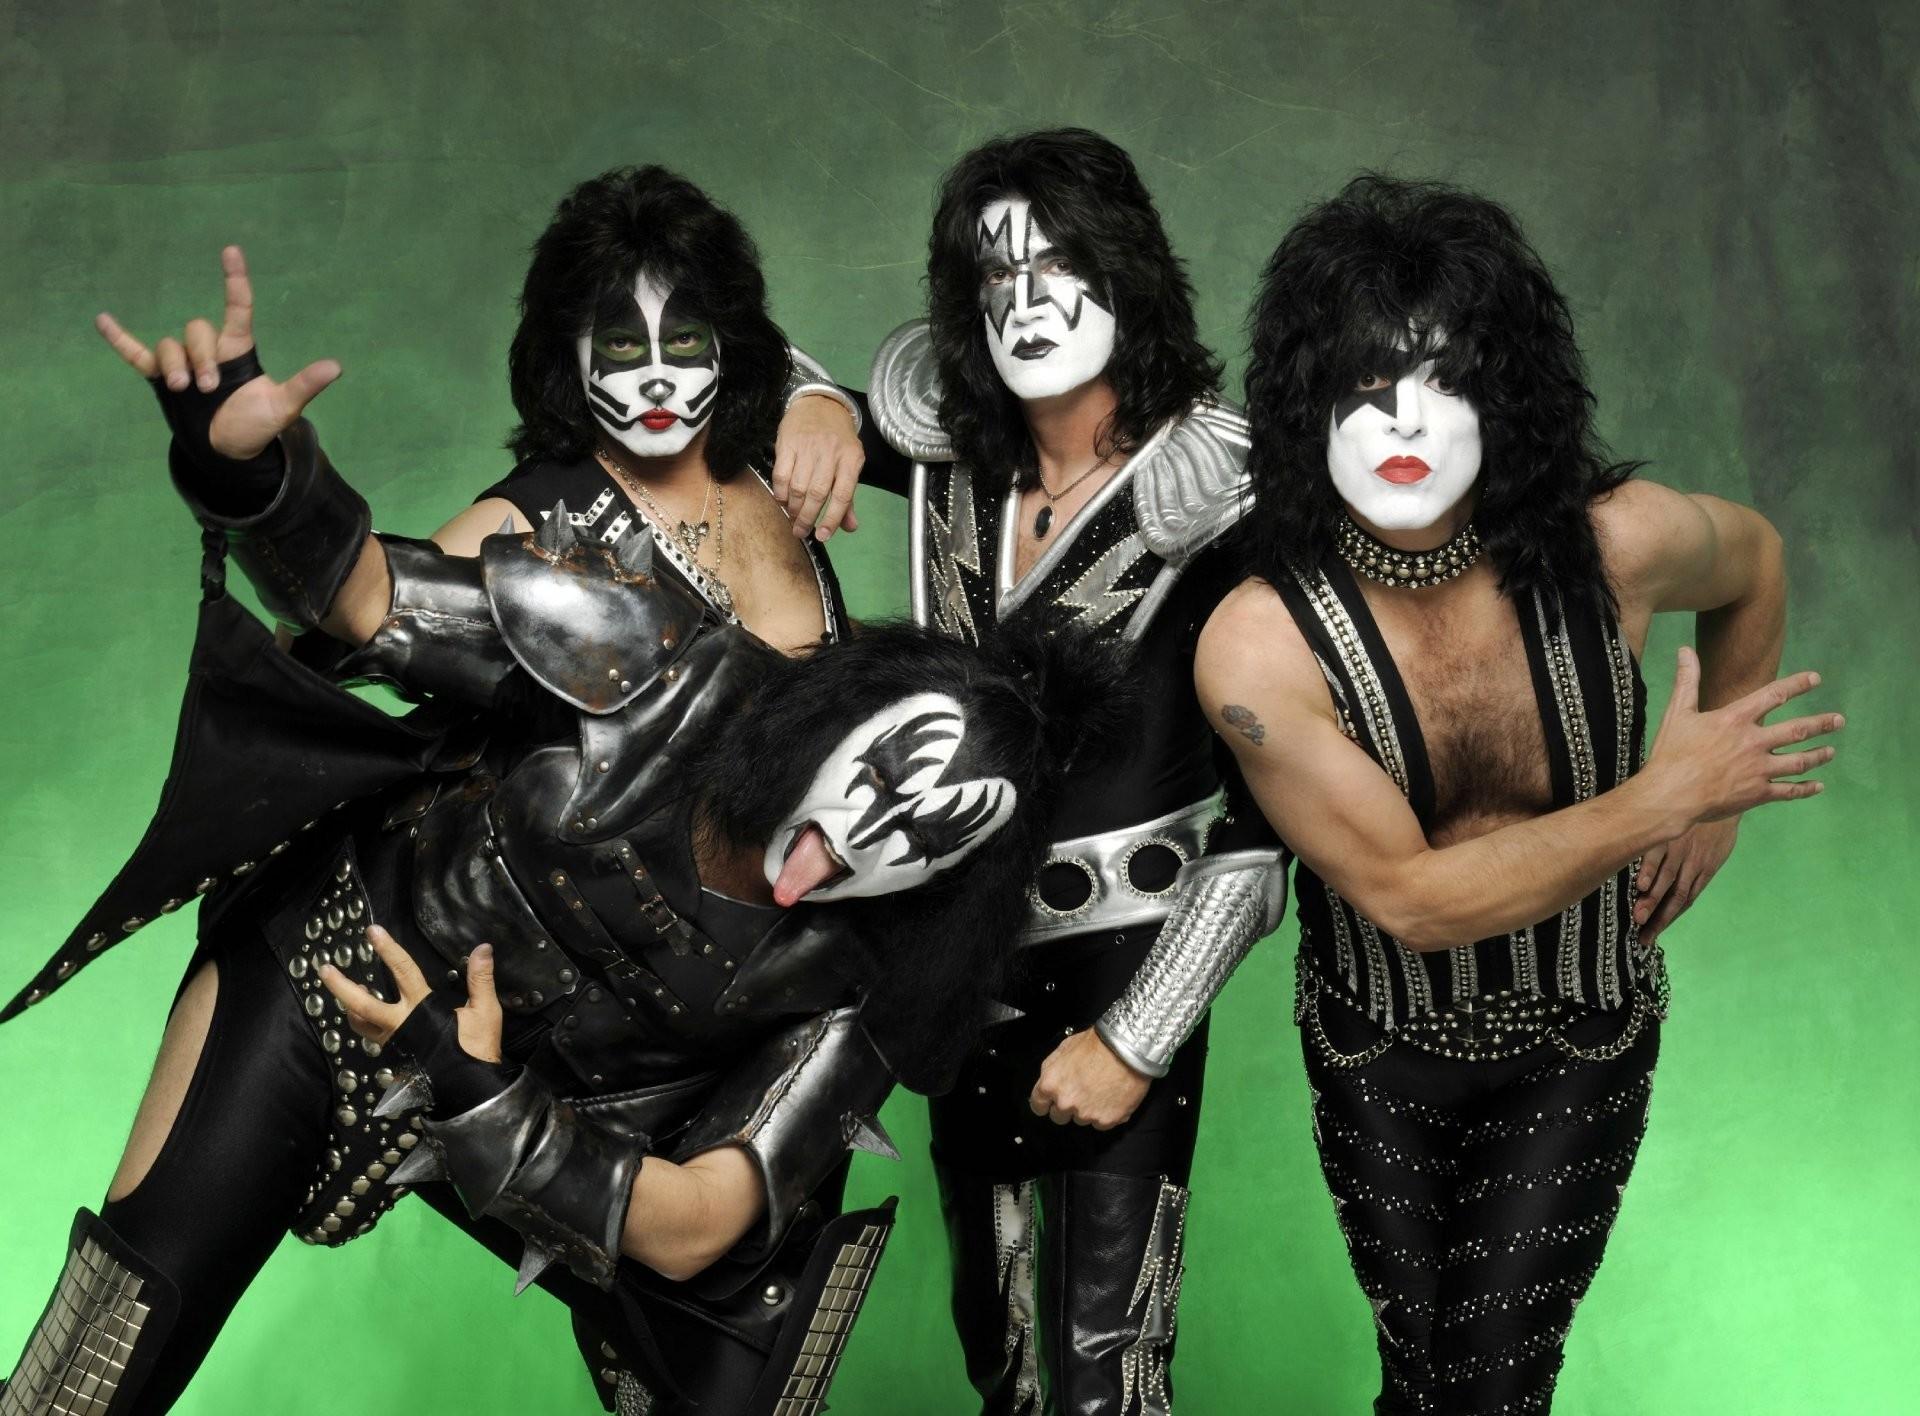 kiss rock band make-up hippie